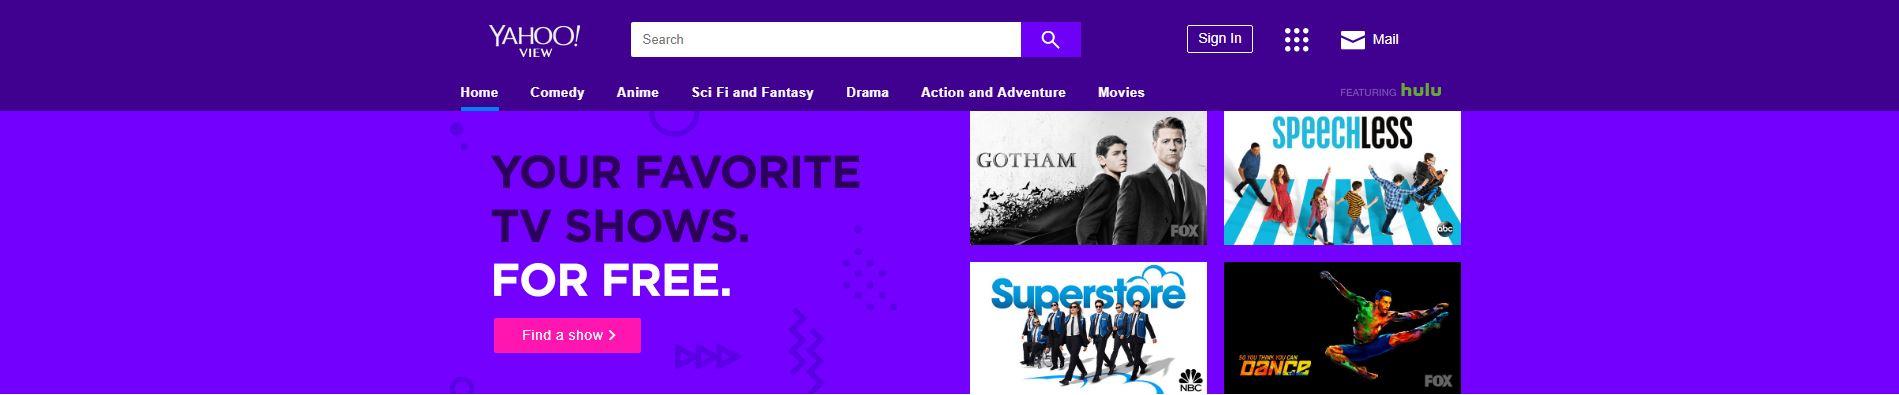 Screenshot of Yahoo View website